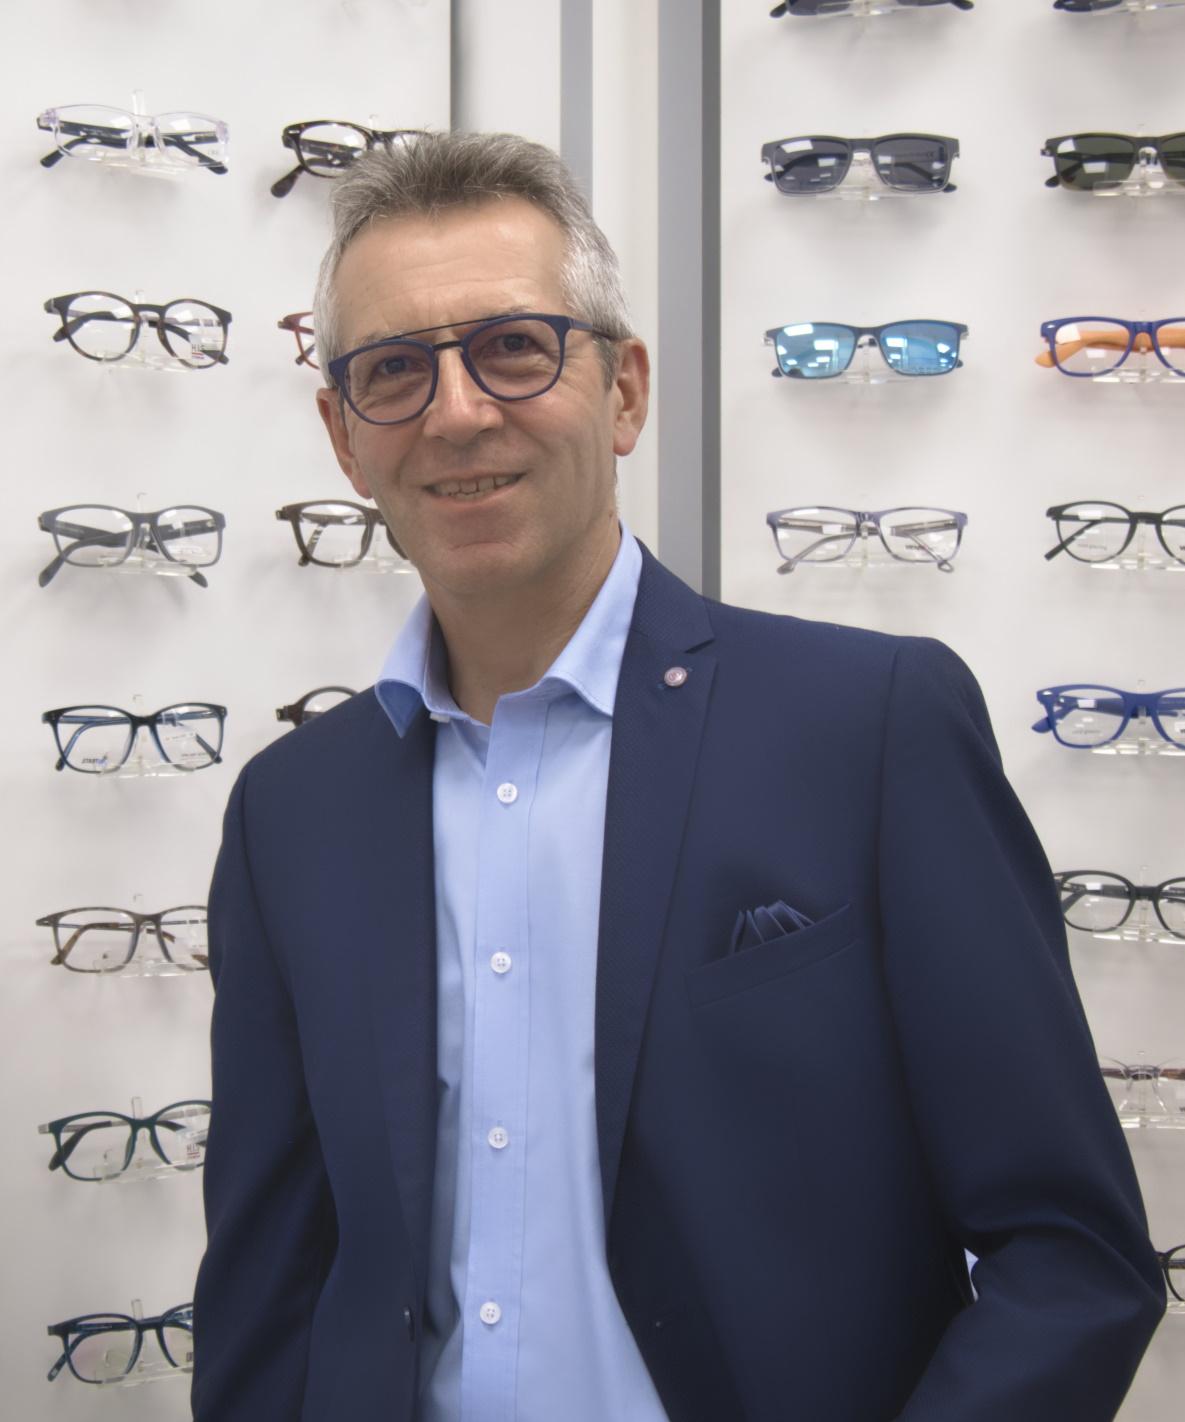 Herr Zinsmaier Augenoptikermeister